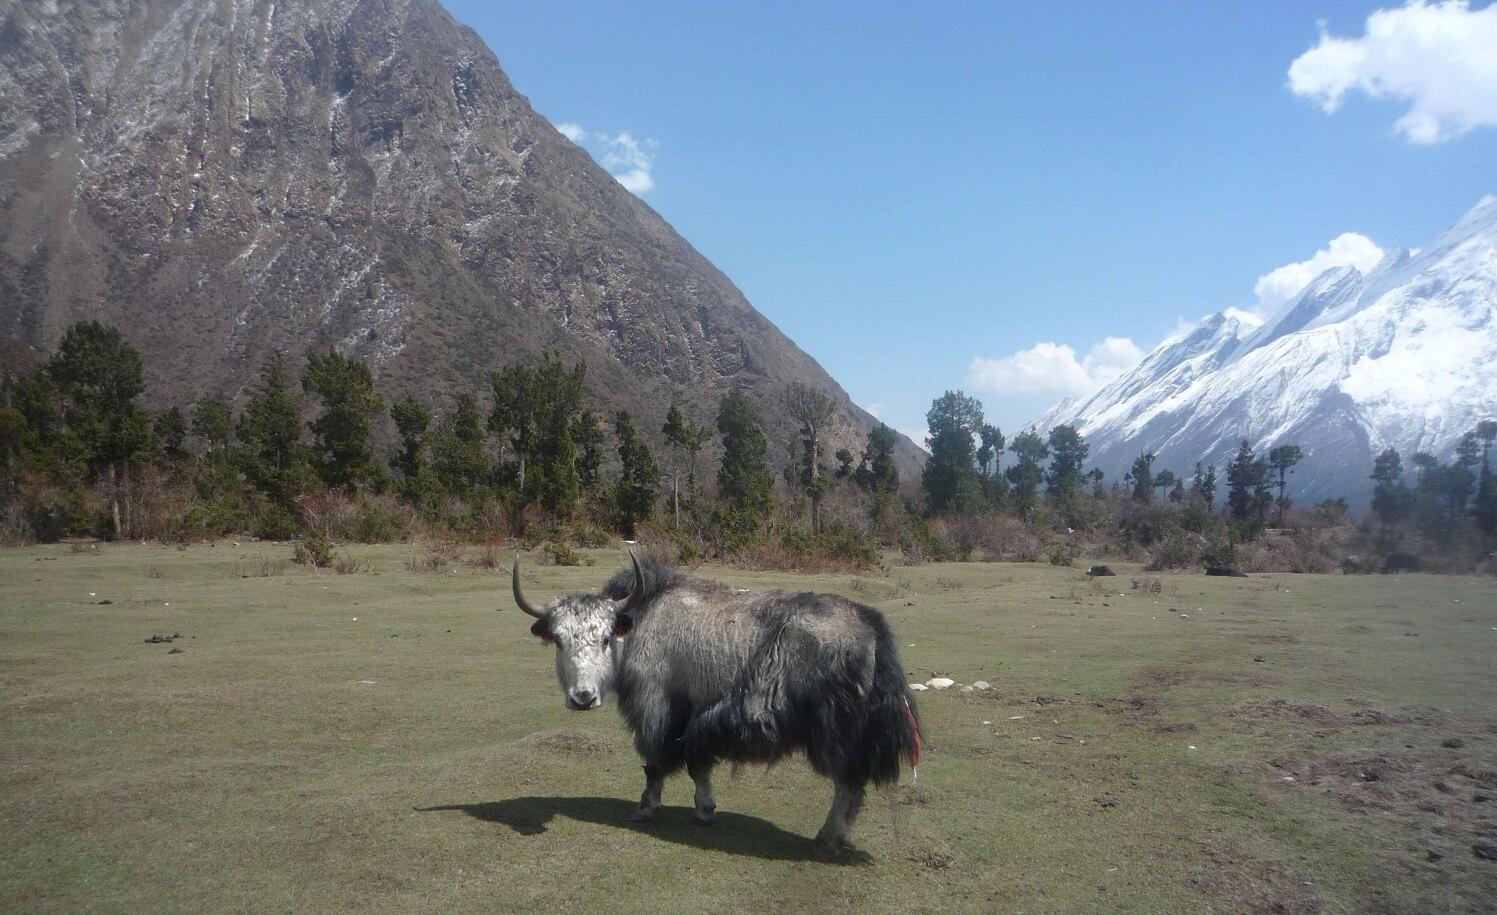 Domestic Yaks on the Way to Manaslu Base Camp